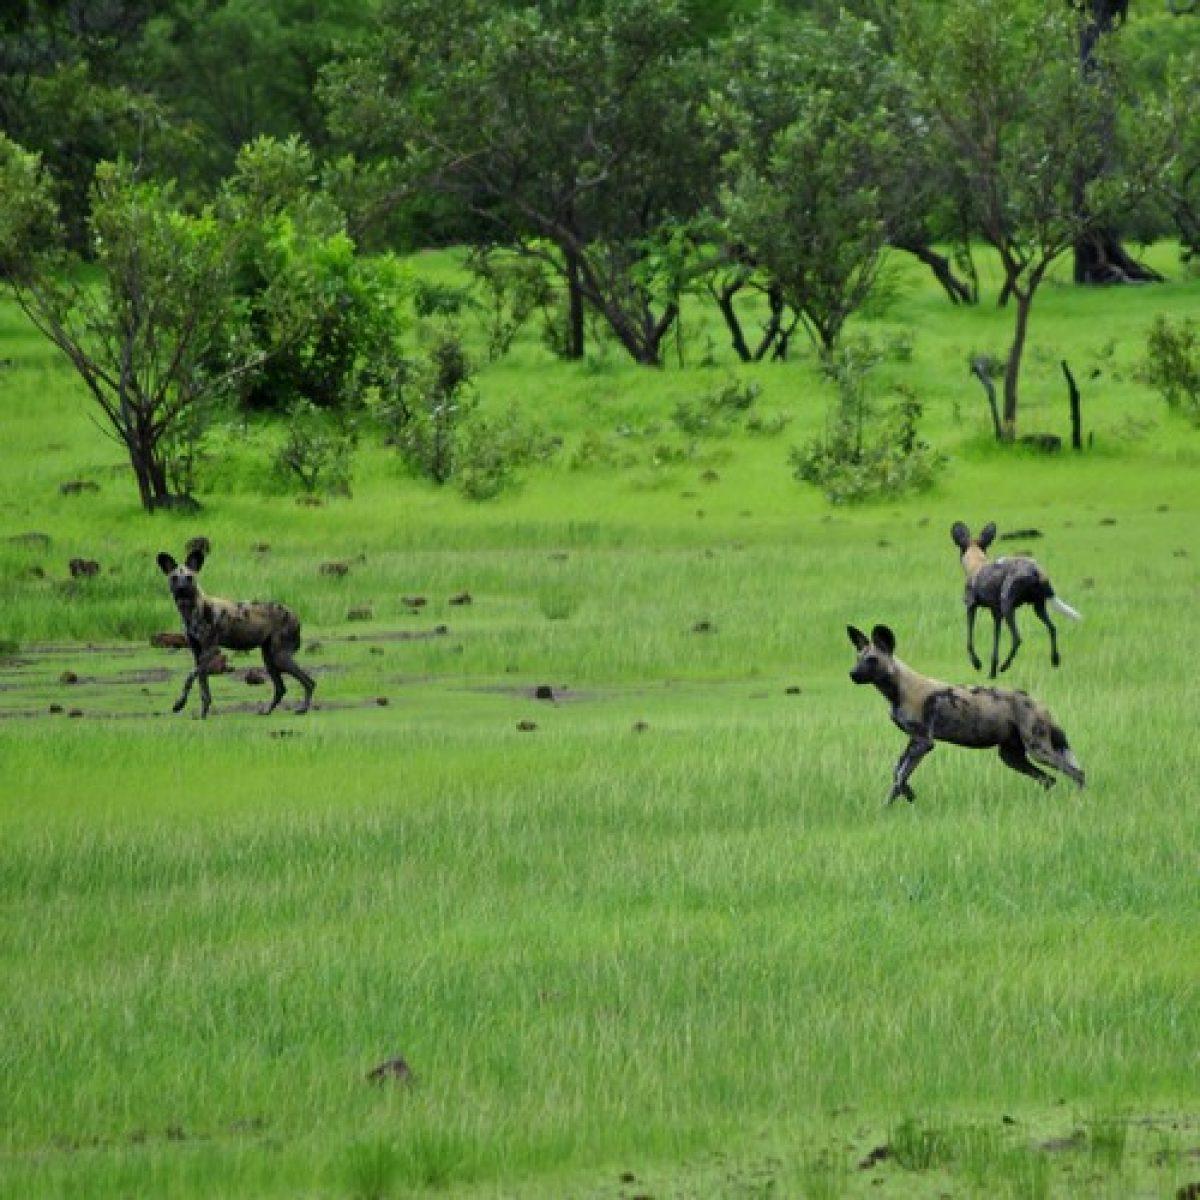 Parques naturales y reservas